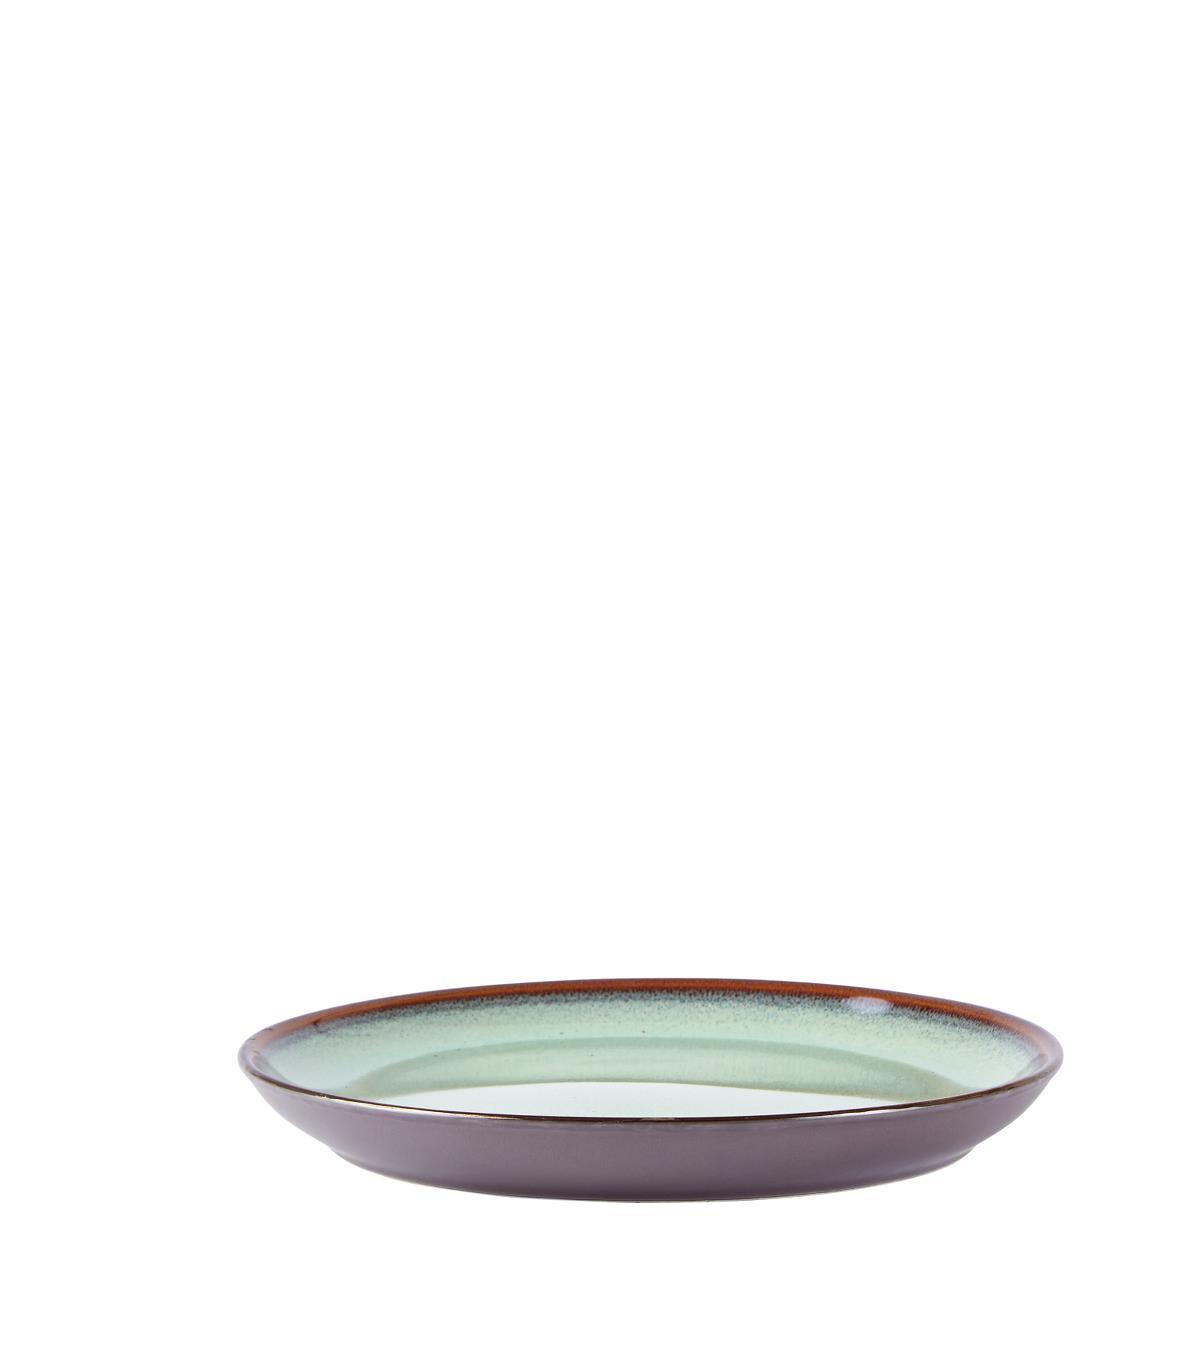 Farfurie Villa Collection, Green, 20 cm, 261212